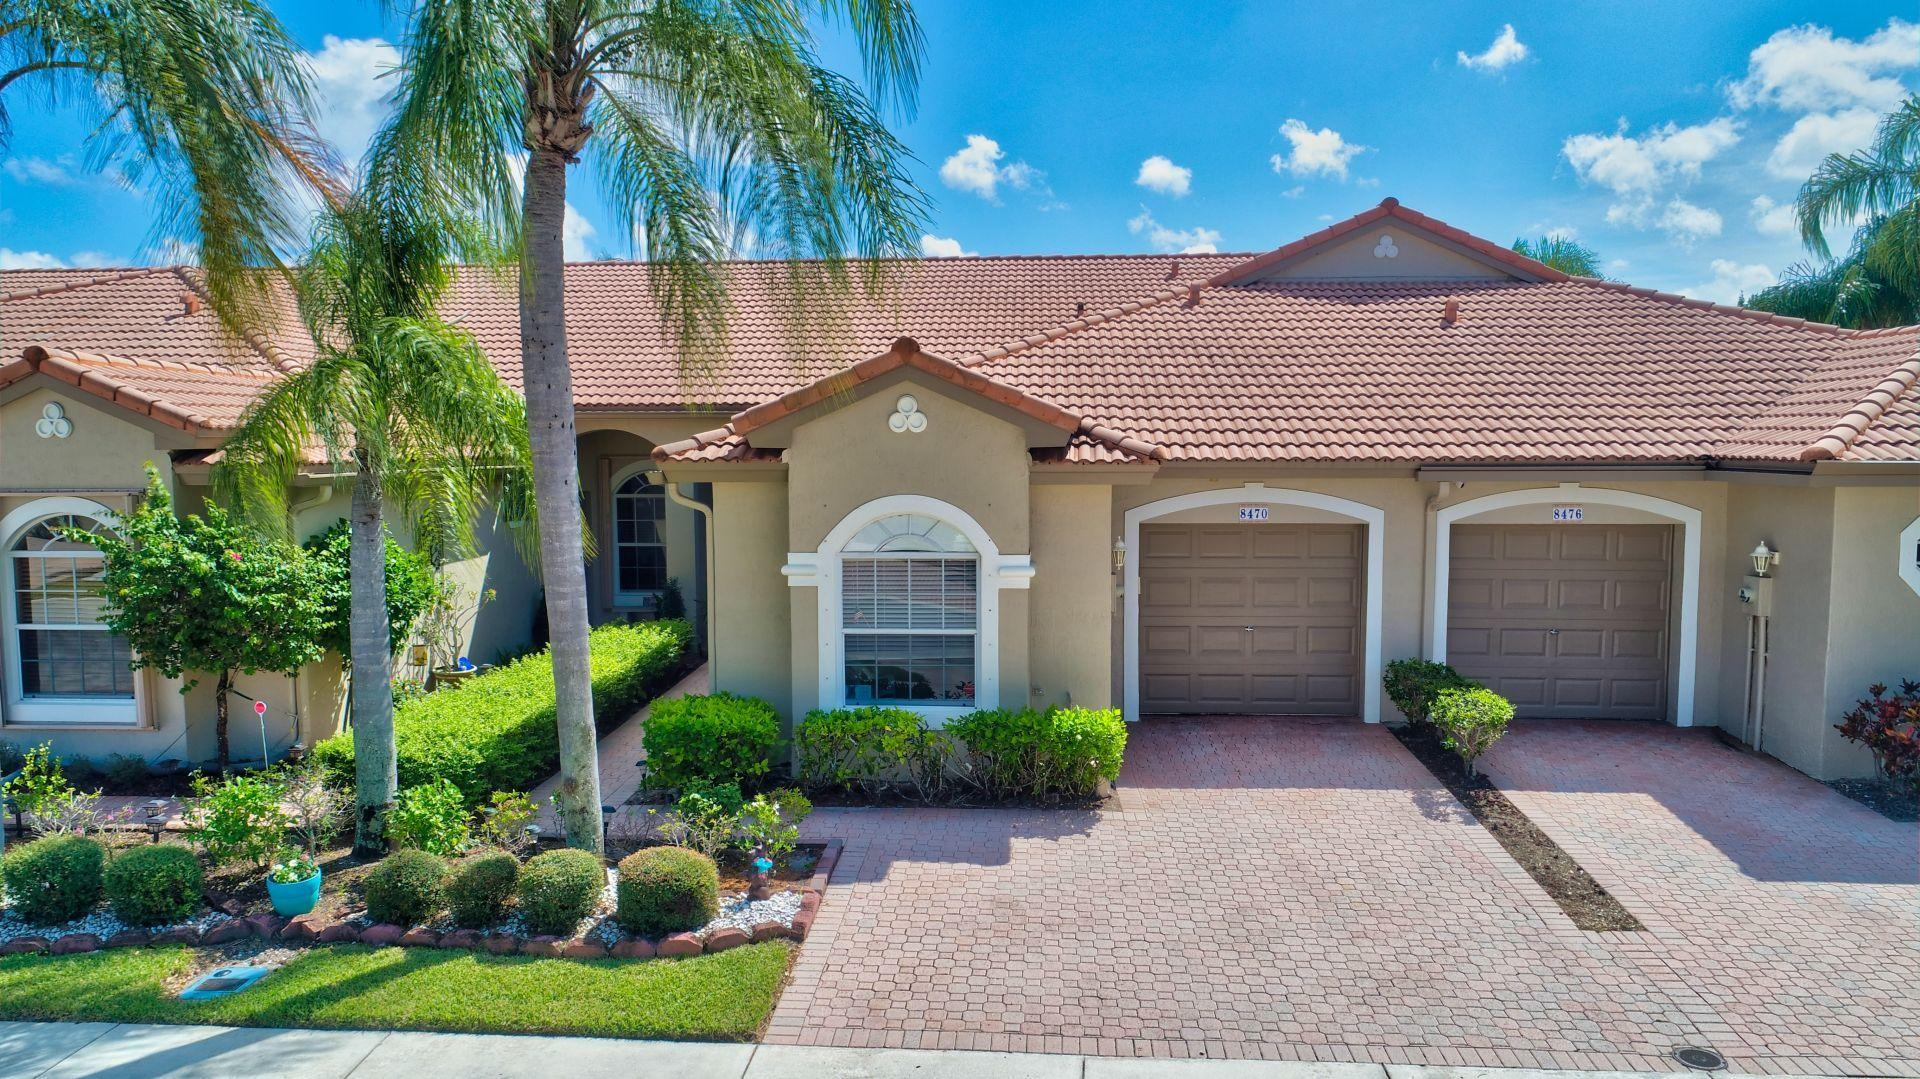 Photo of home for sale at 8470 Via Serena, Boca Raton FL